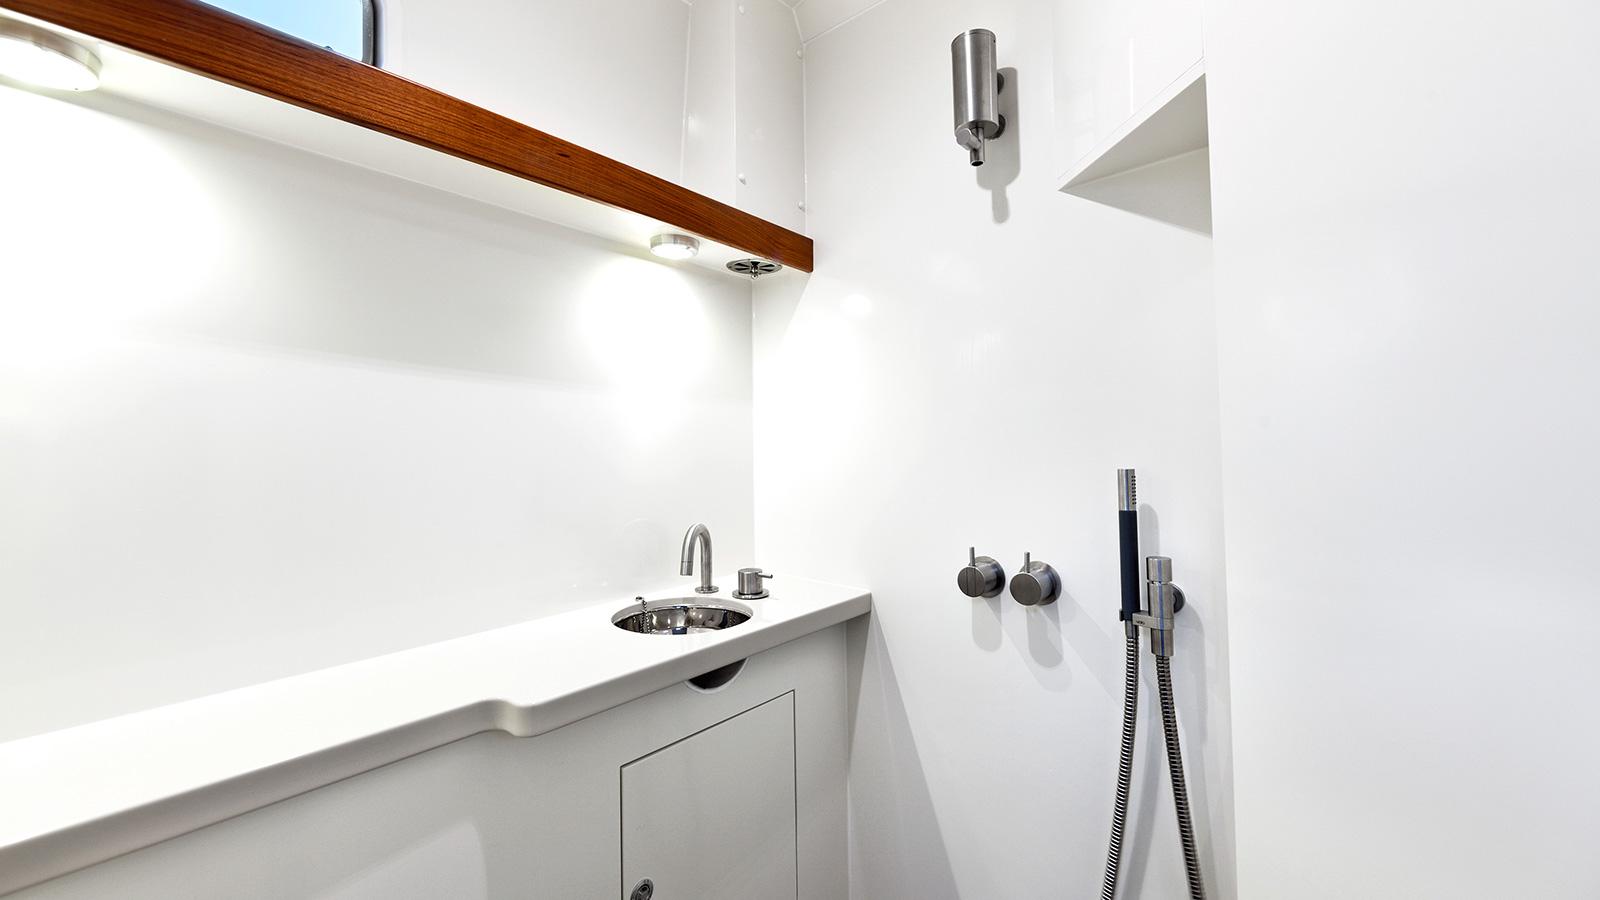 Rupert-50-interior-shower-small.jpg